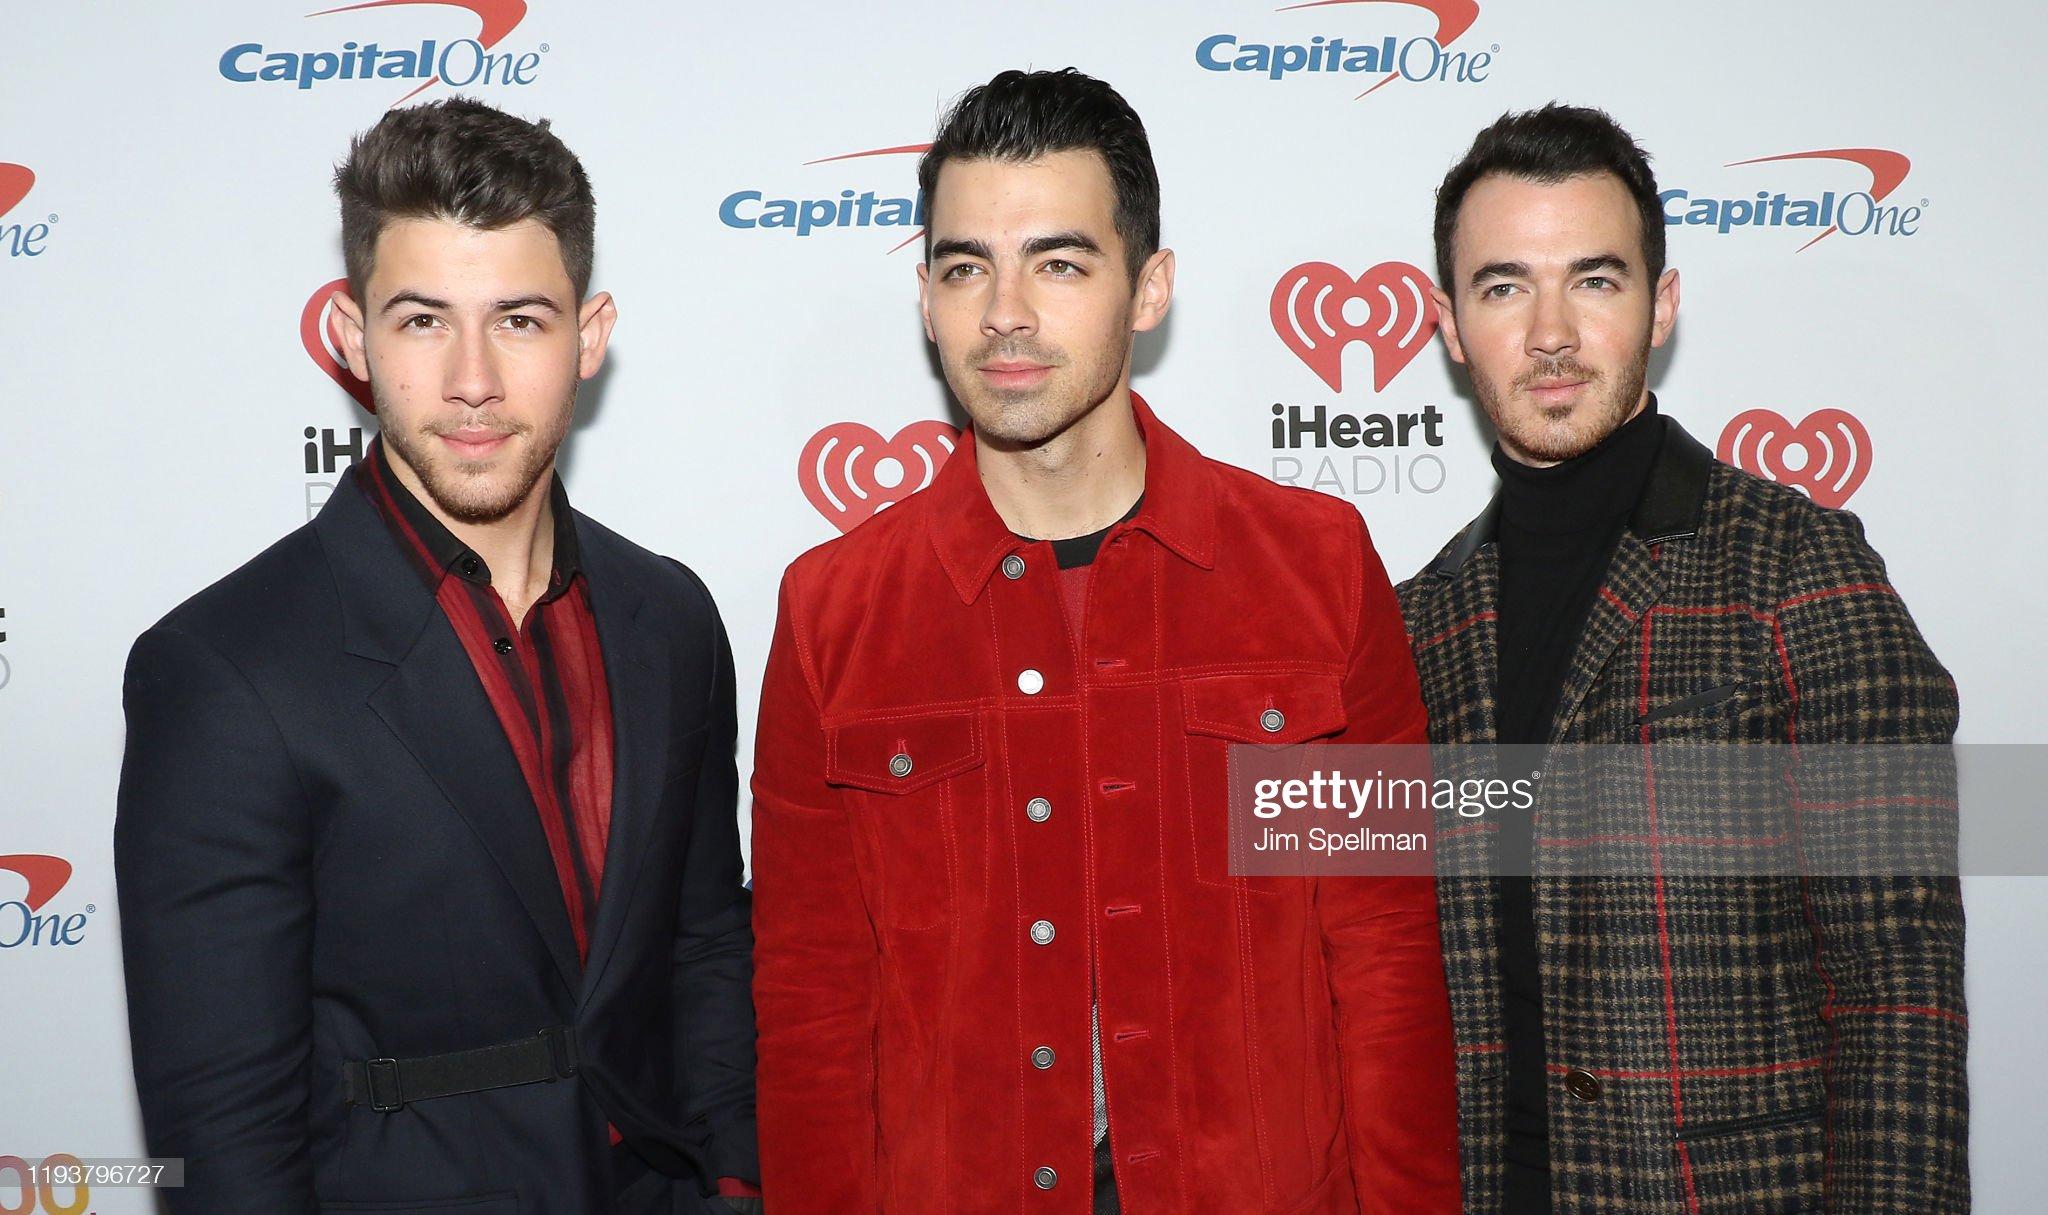 ¿Cuánto mide Nick Jonas? - Altura - Real height - Página 2 Musicians-nick-jonas-joe-jonas-and-kevin-jonas-arrive-at-iheartradios-picture-id1193796727?s=2048x2048